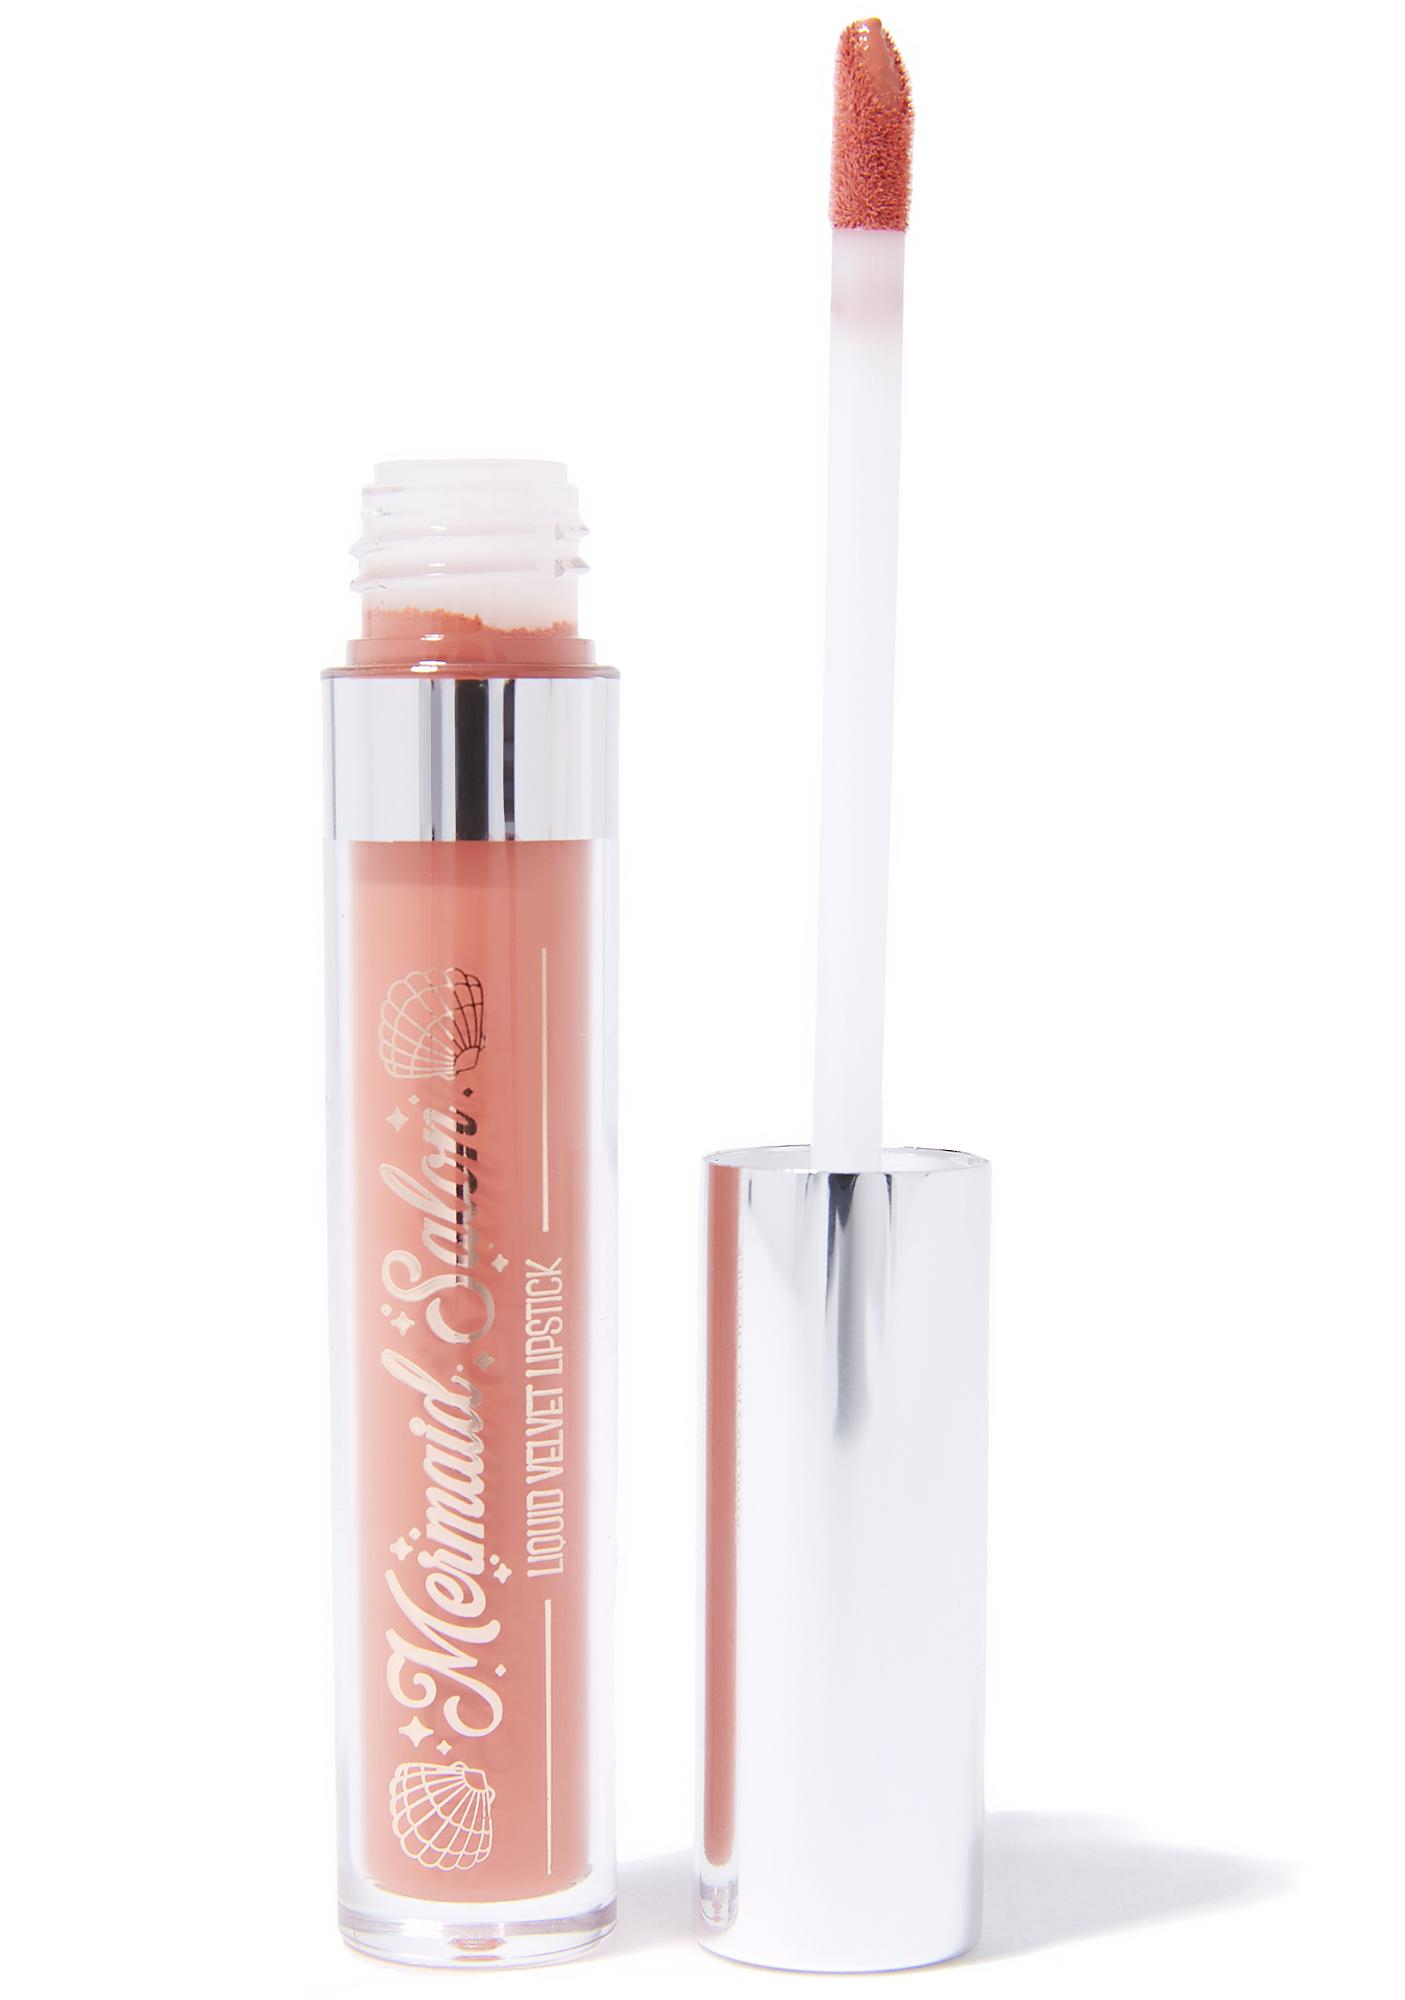 Mermaid Salon Zoe Loves Harry Liquid Lipstick